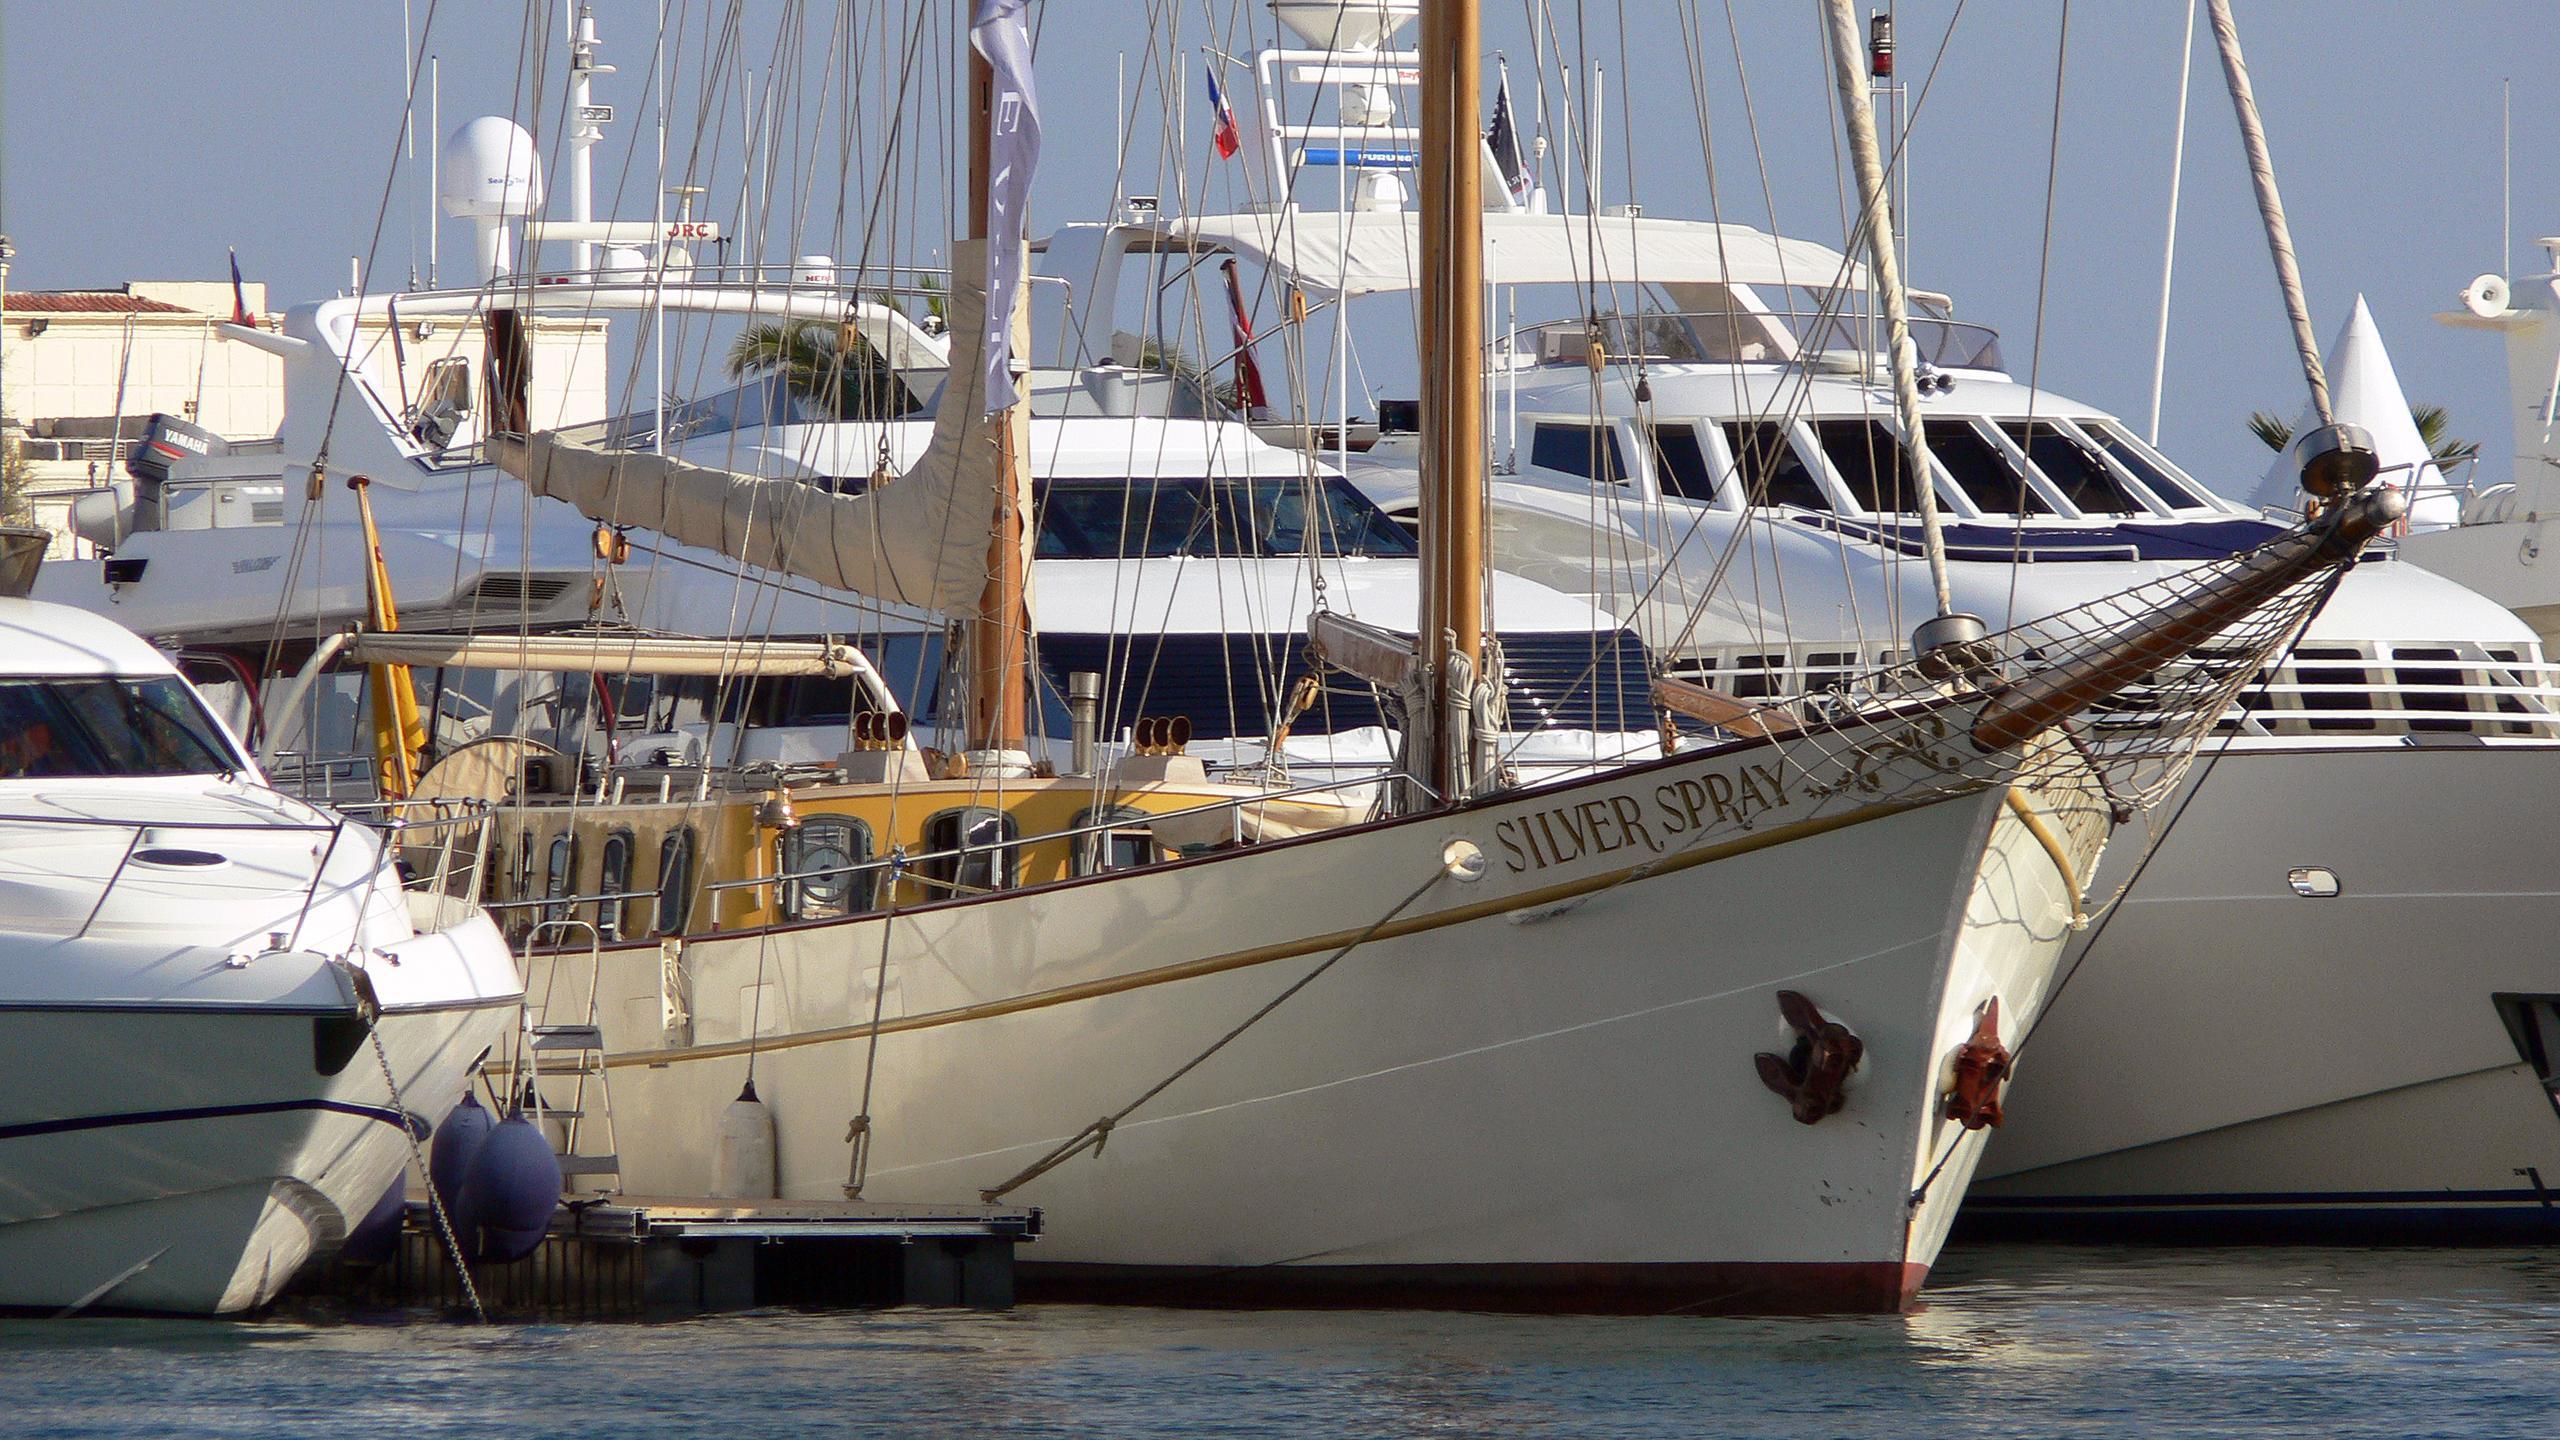 silver-spray-sailing-yacht-1916-34m-moored-half-profile